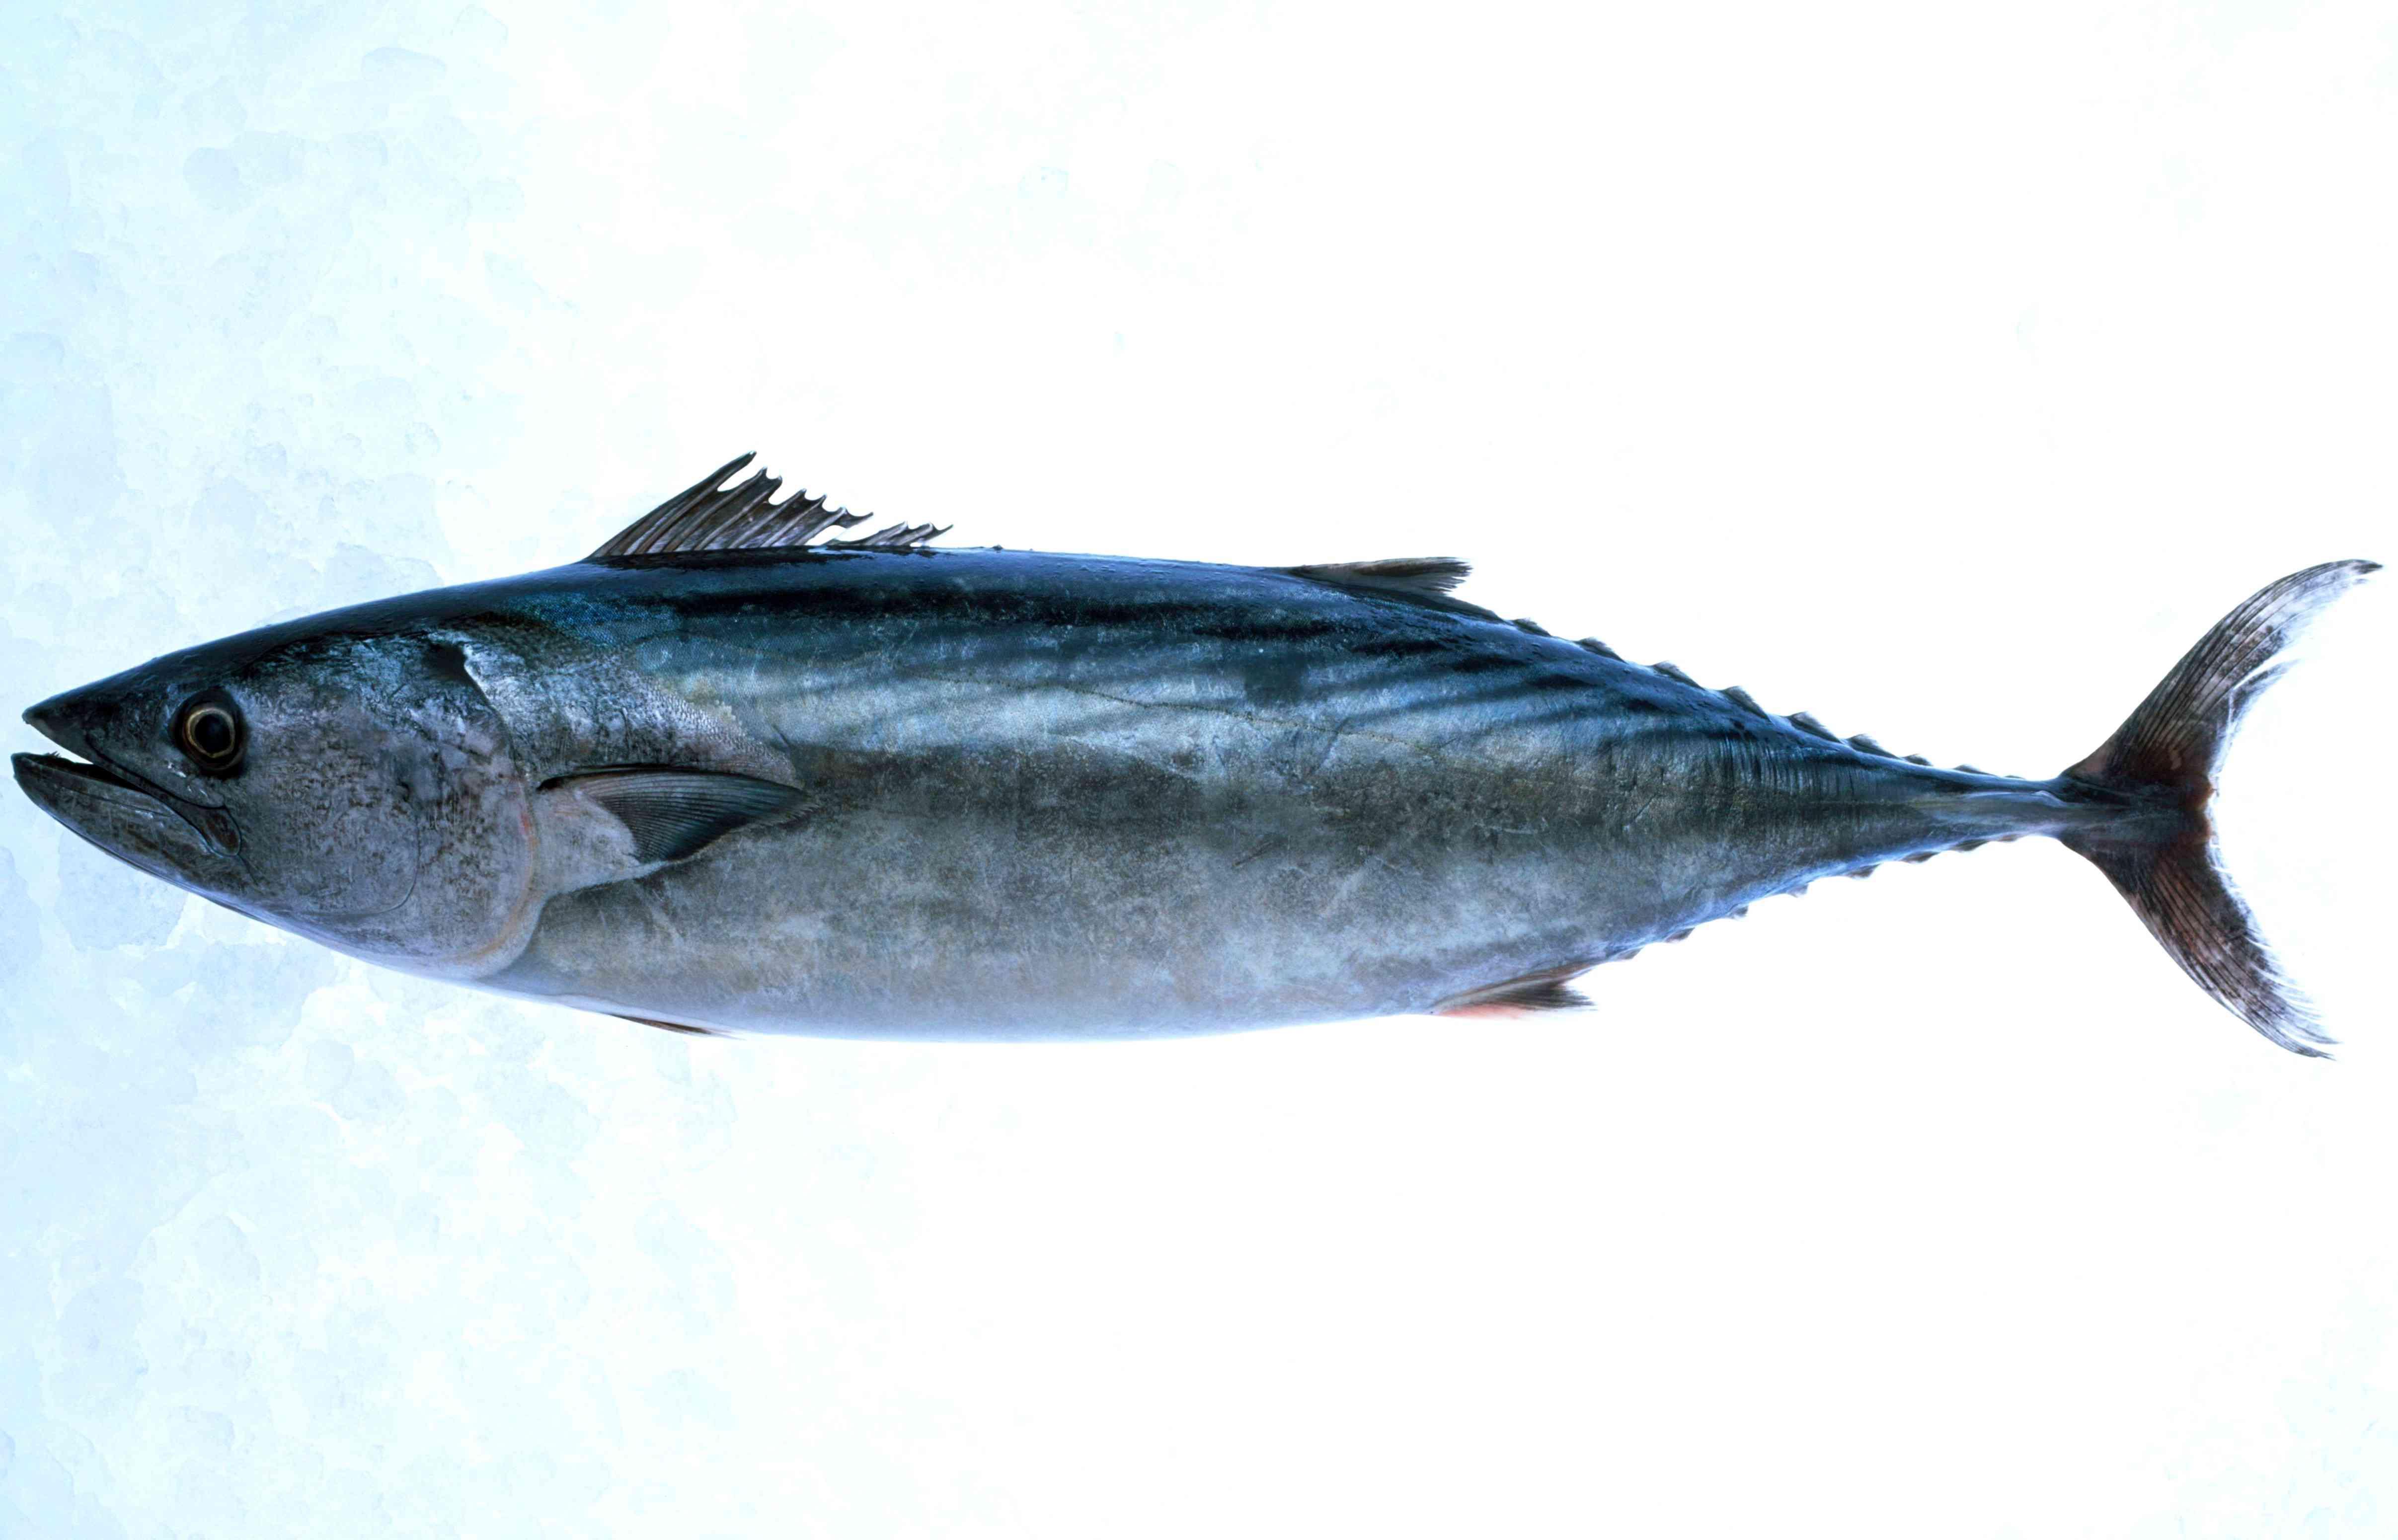 An Atlantic bonito (Sarda sarda) specimen on ice